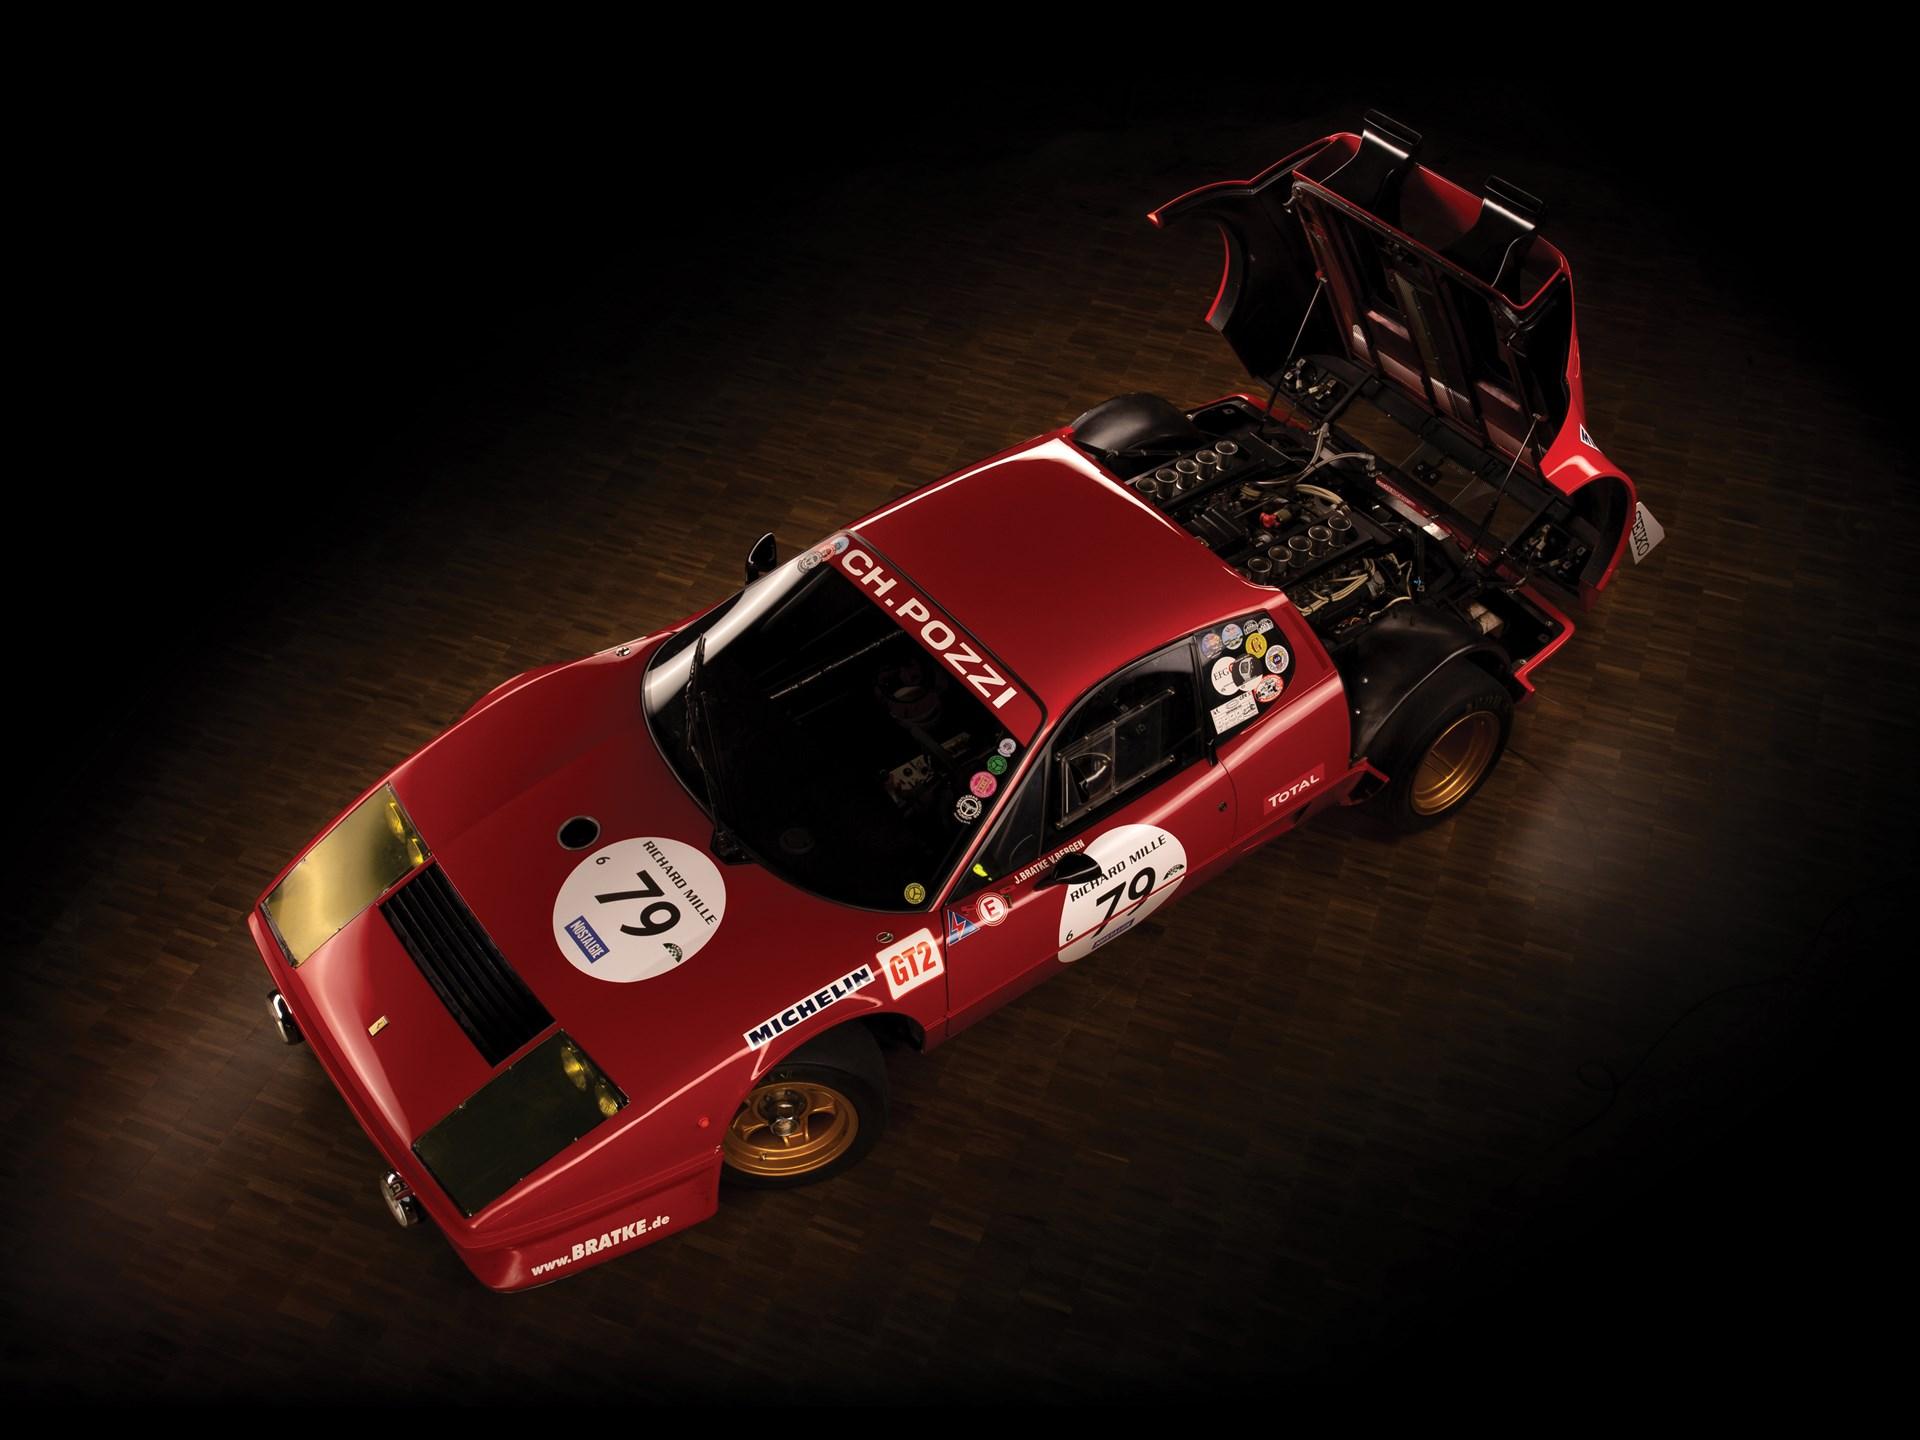 1980 Ferrari 512 BB Competizione above hood open